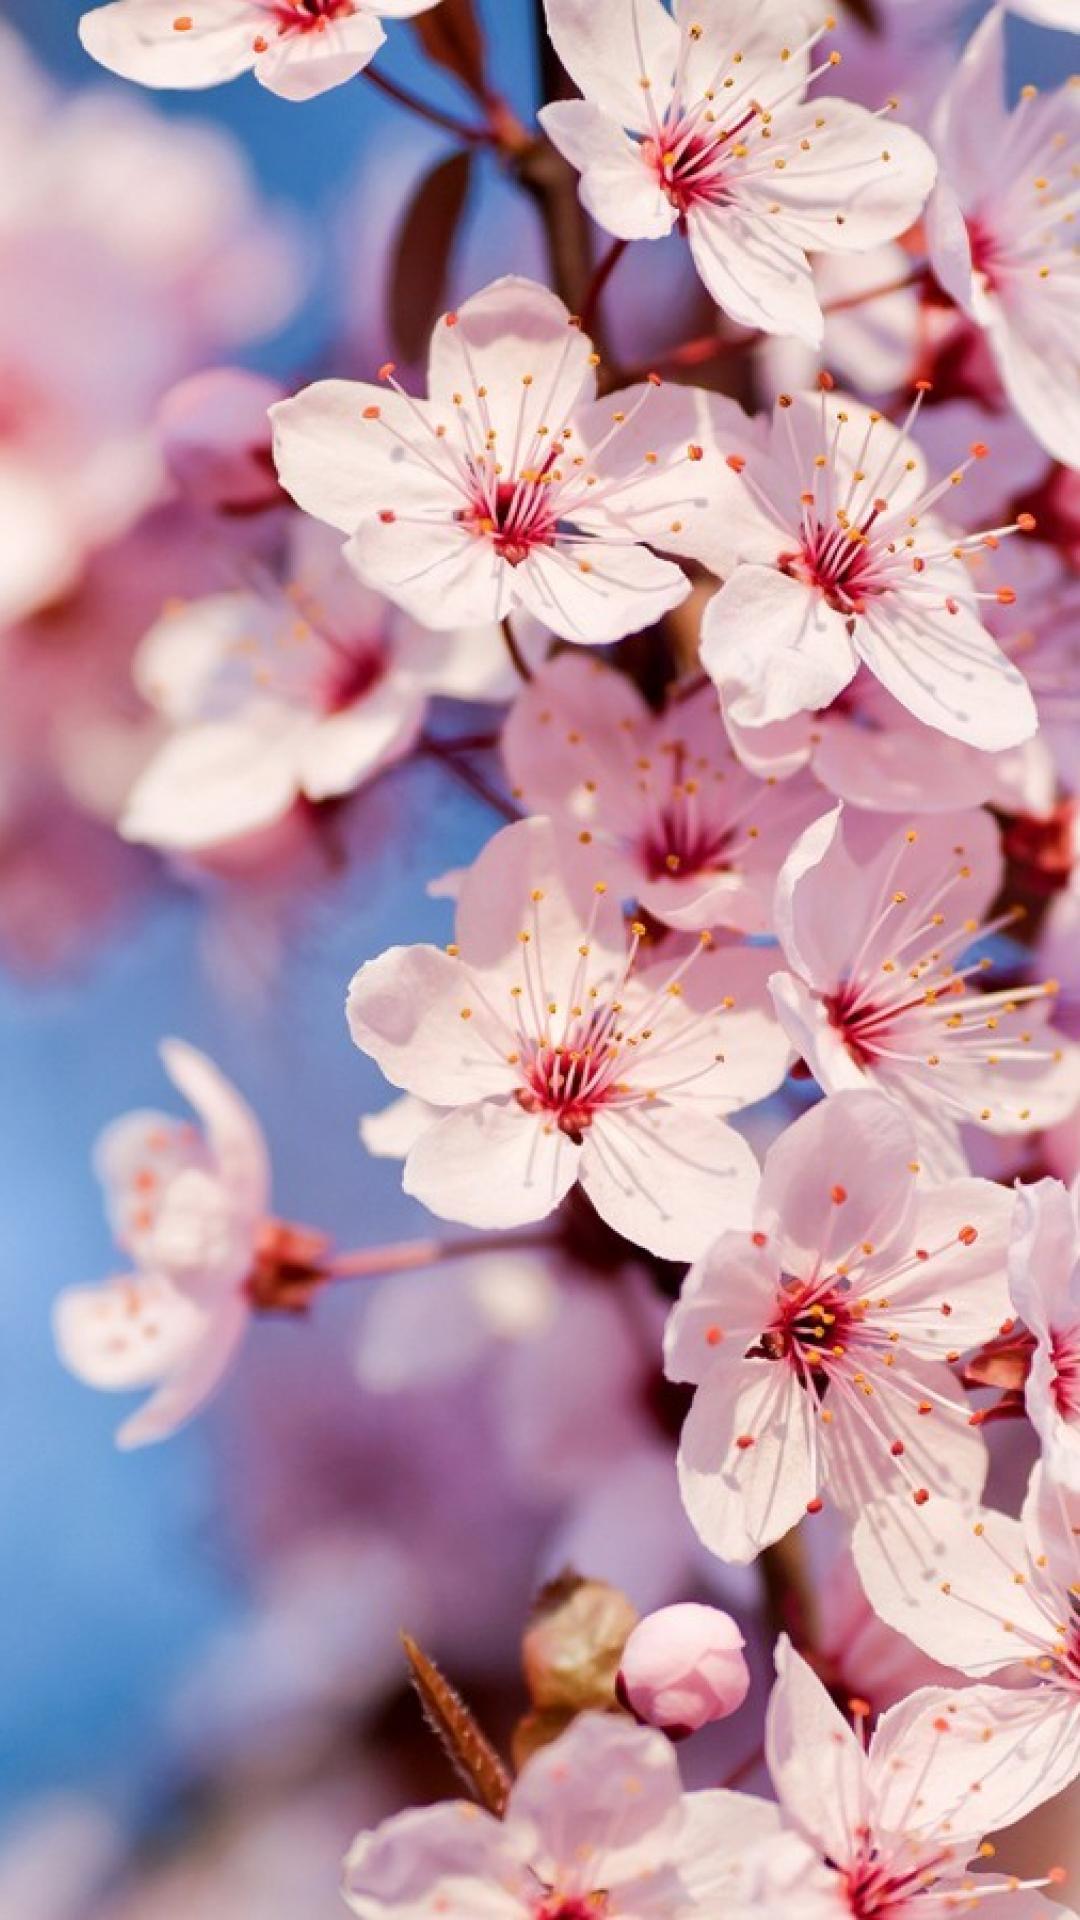 Mobil Hd Wallpaper Cherry Blossom Iphone Hd Wallpaper Pixelstalk Net